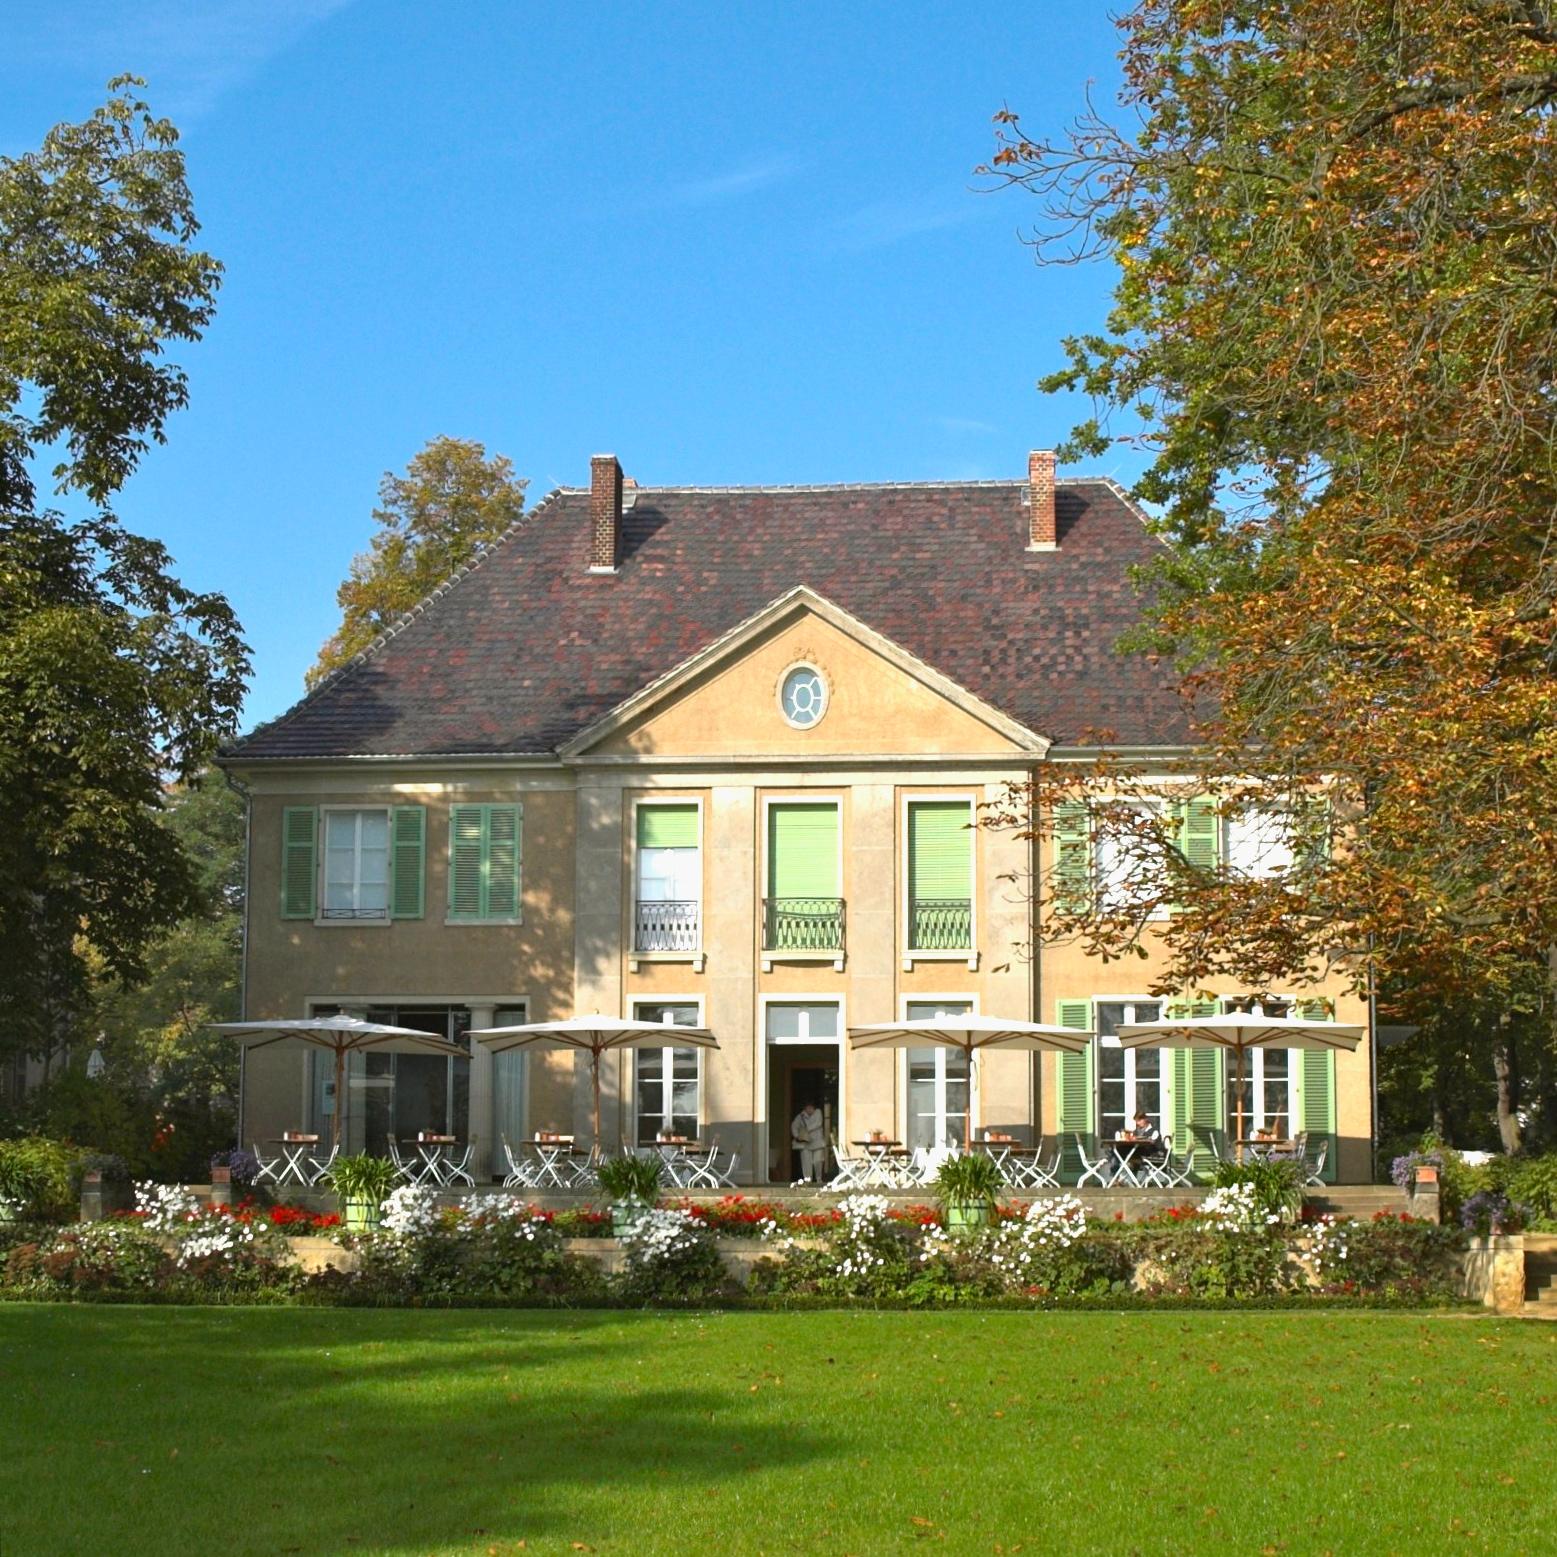 Liebermannvilla Oktober 2006